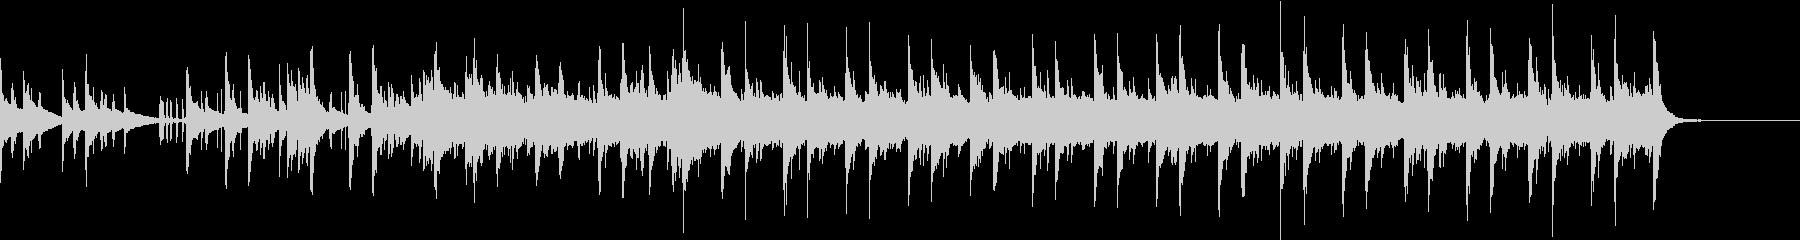 J-Popバラード(しっとり切ない)の未再生の波形